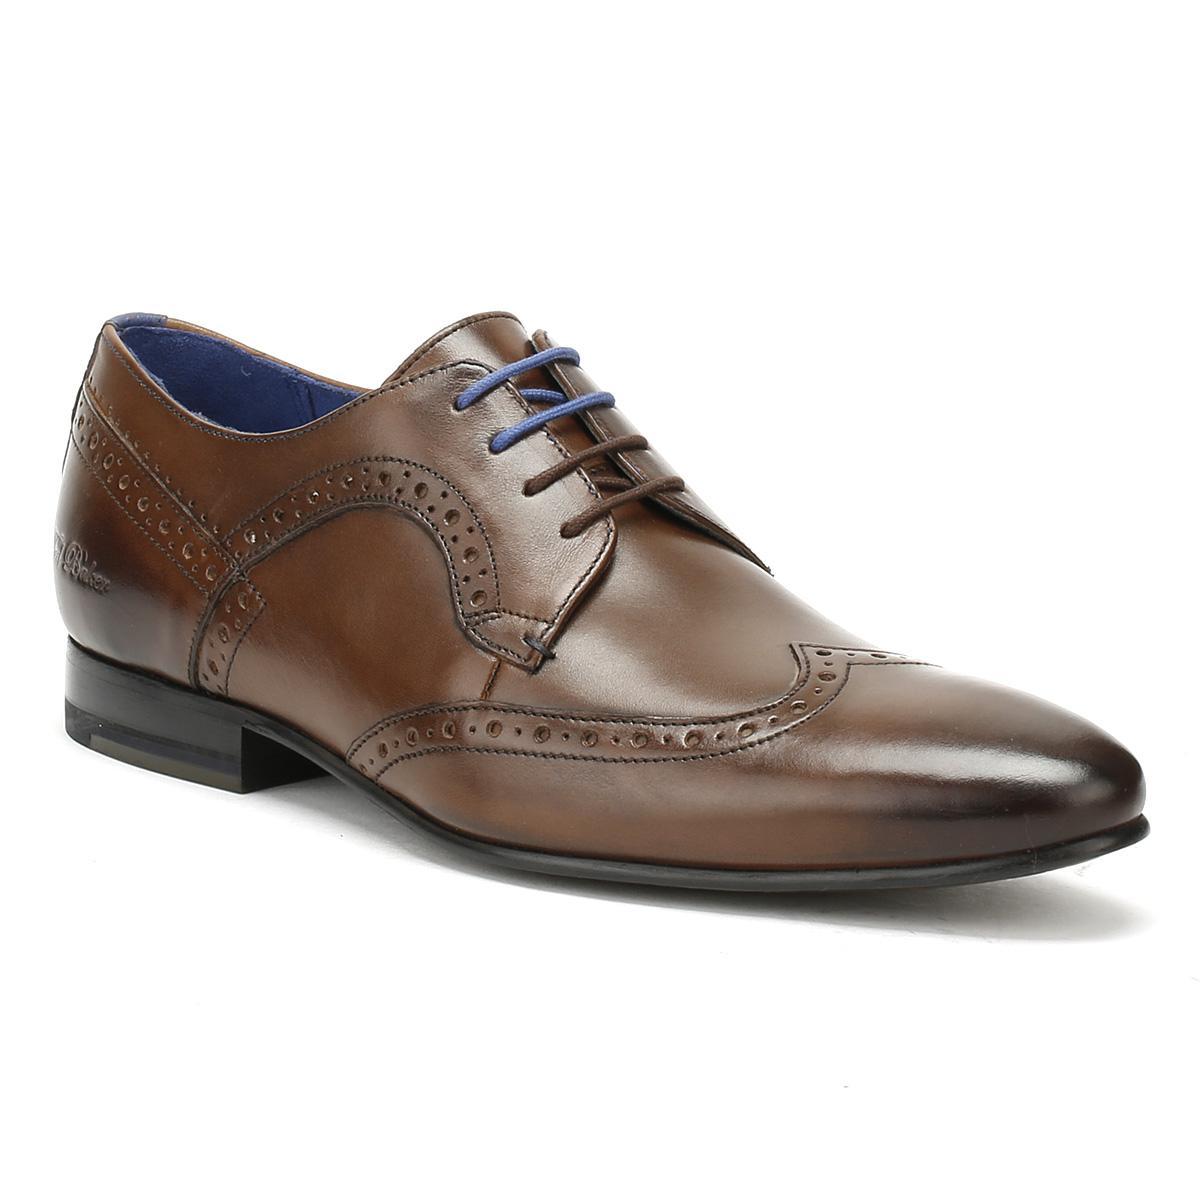 Ollivur Mens Shoes Tan